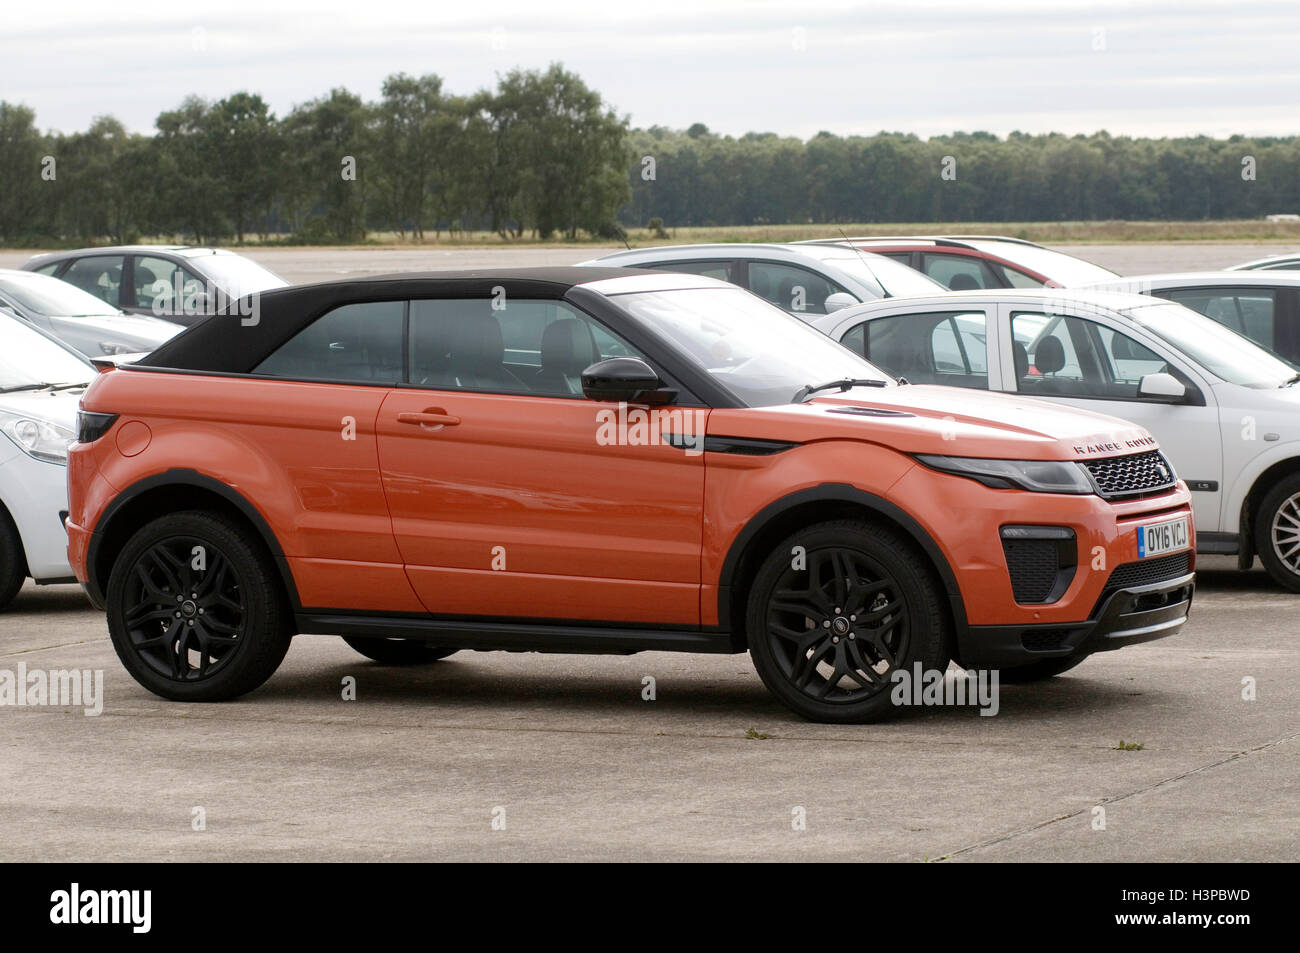 range rover evoque soft top convertible - Stock Image